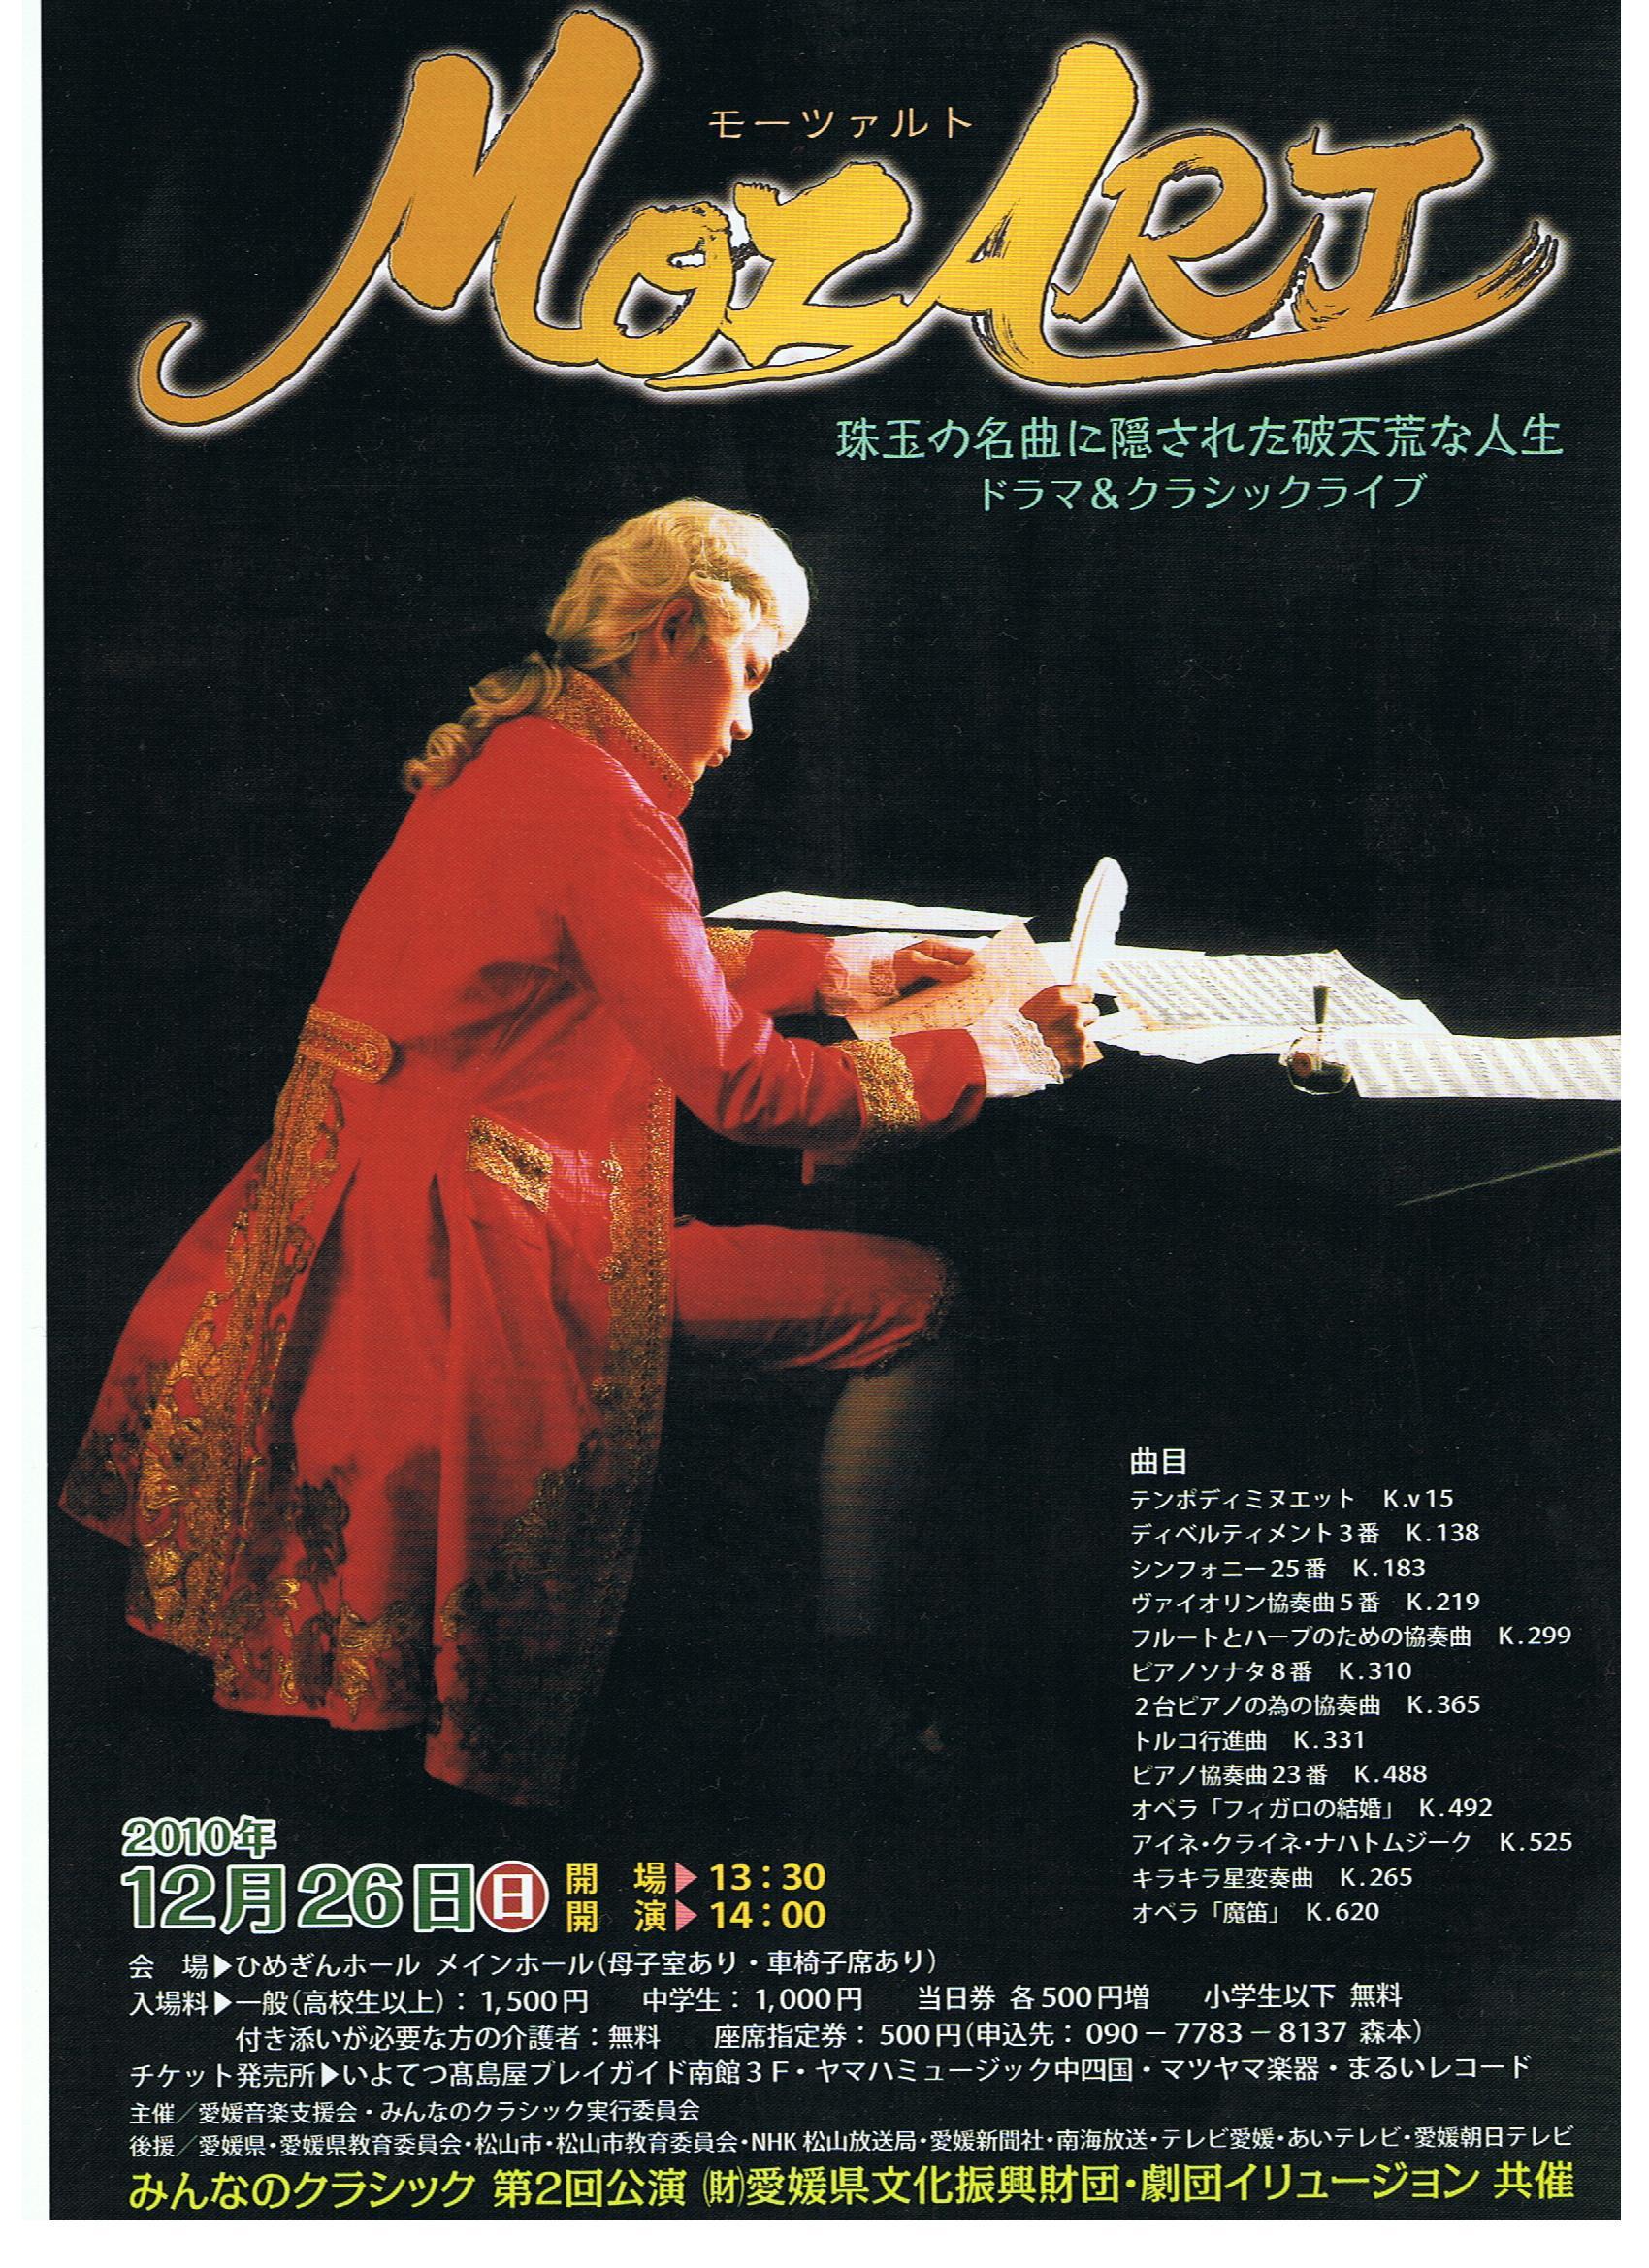 Mozart チラシ表